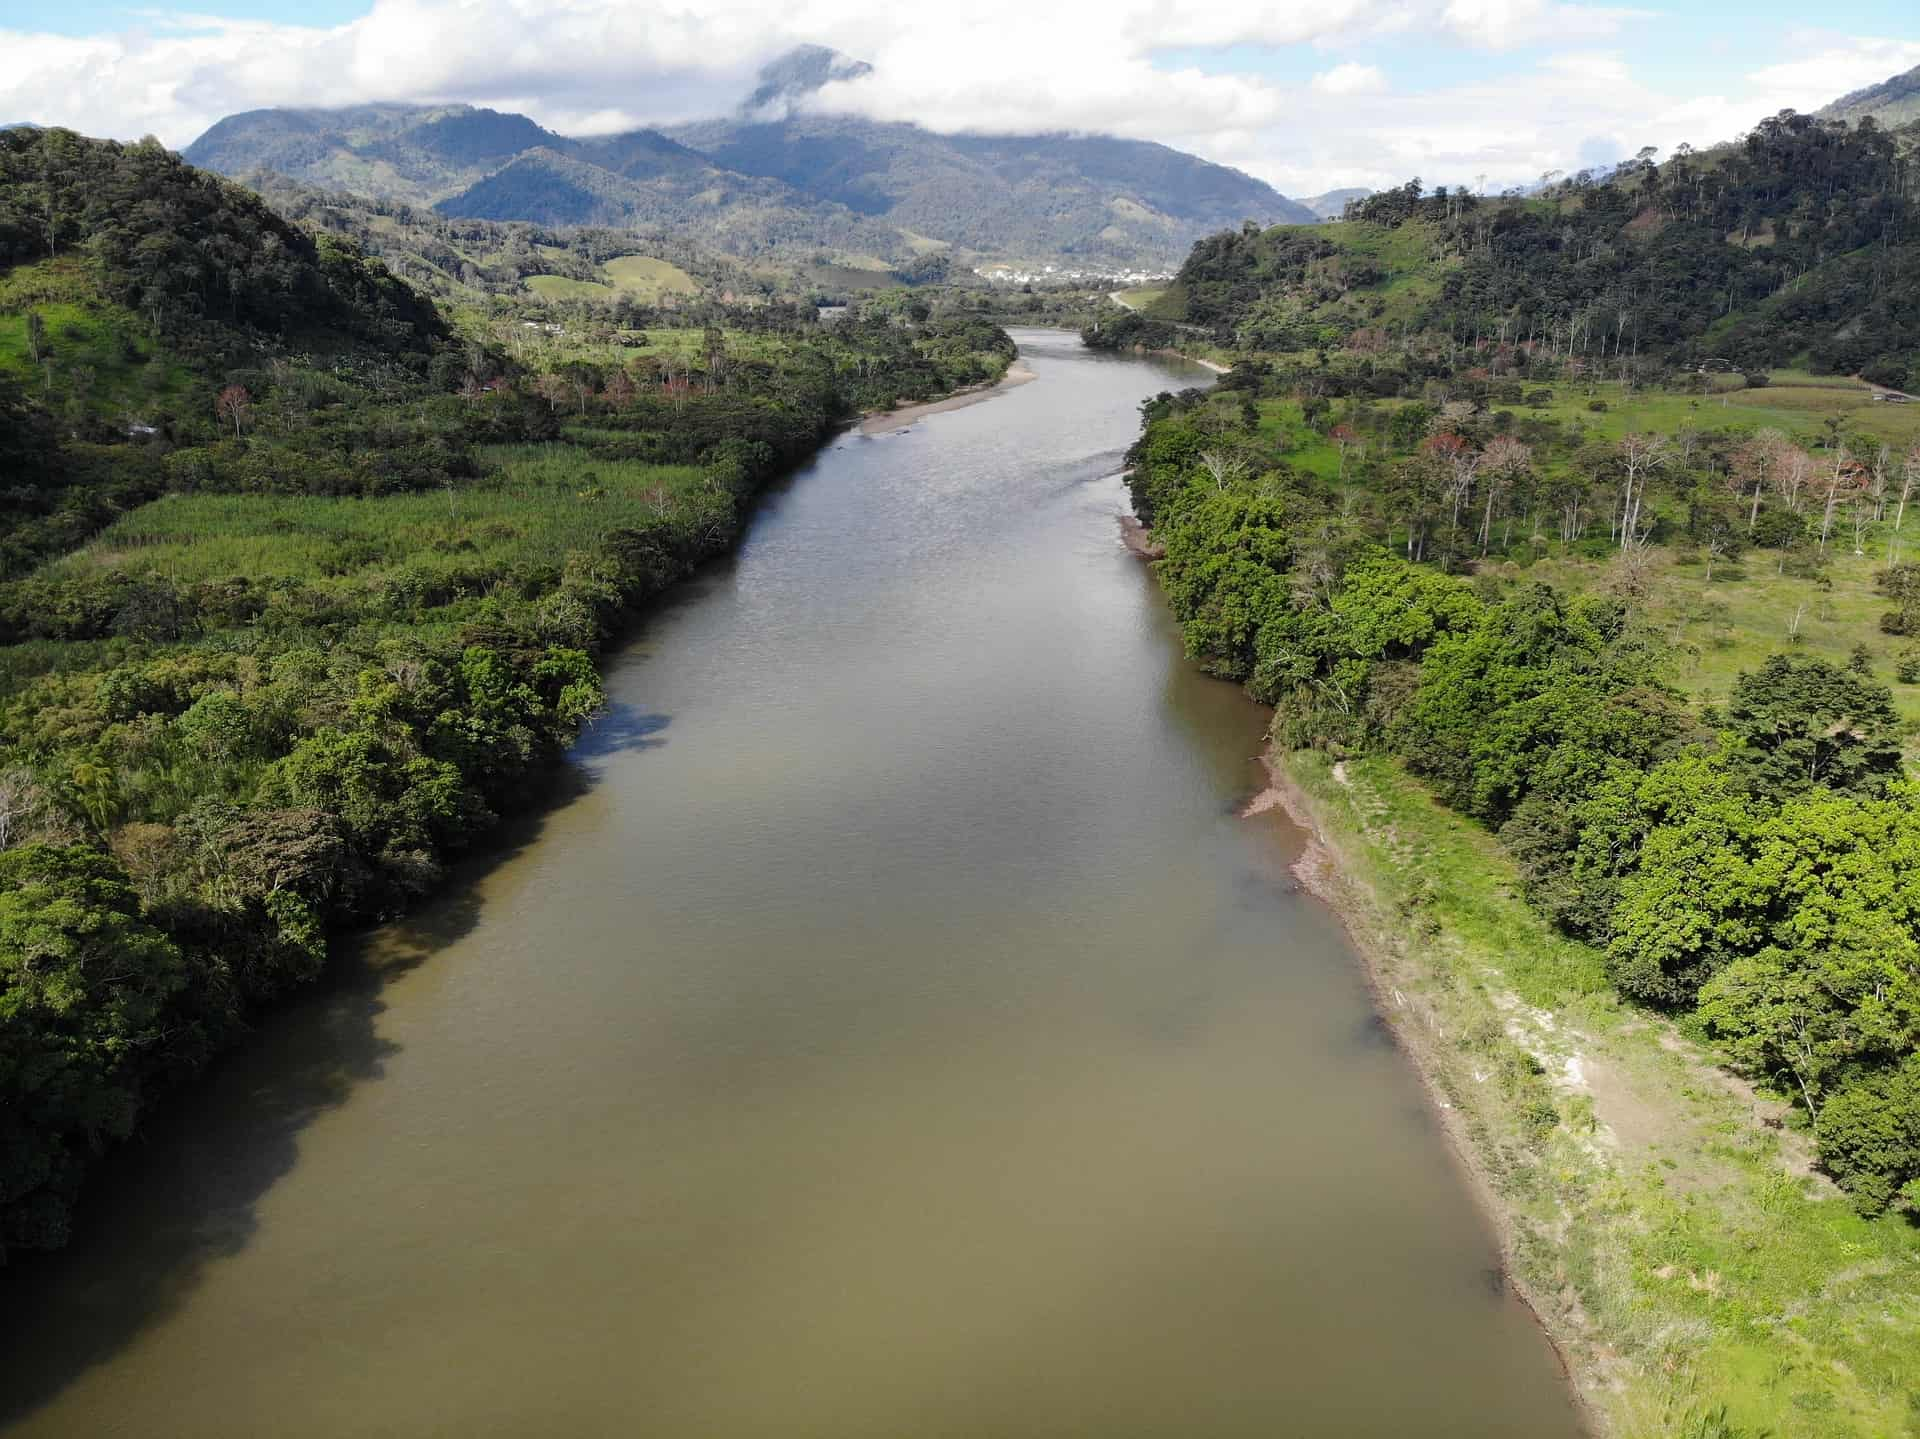 Amazon River Course